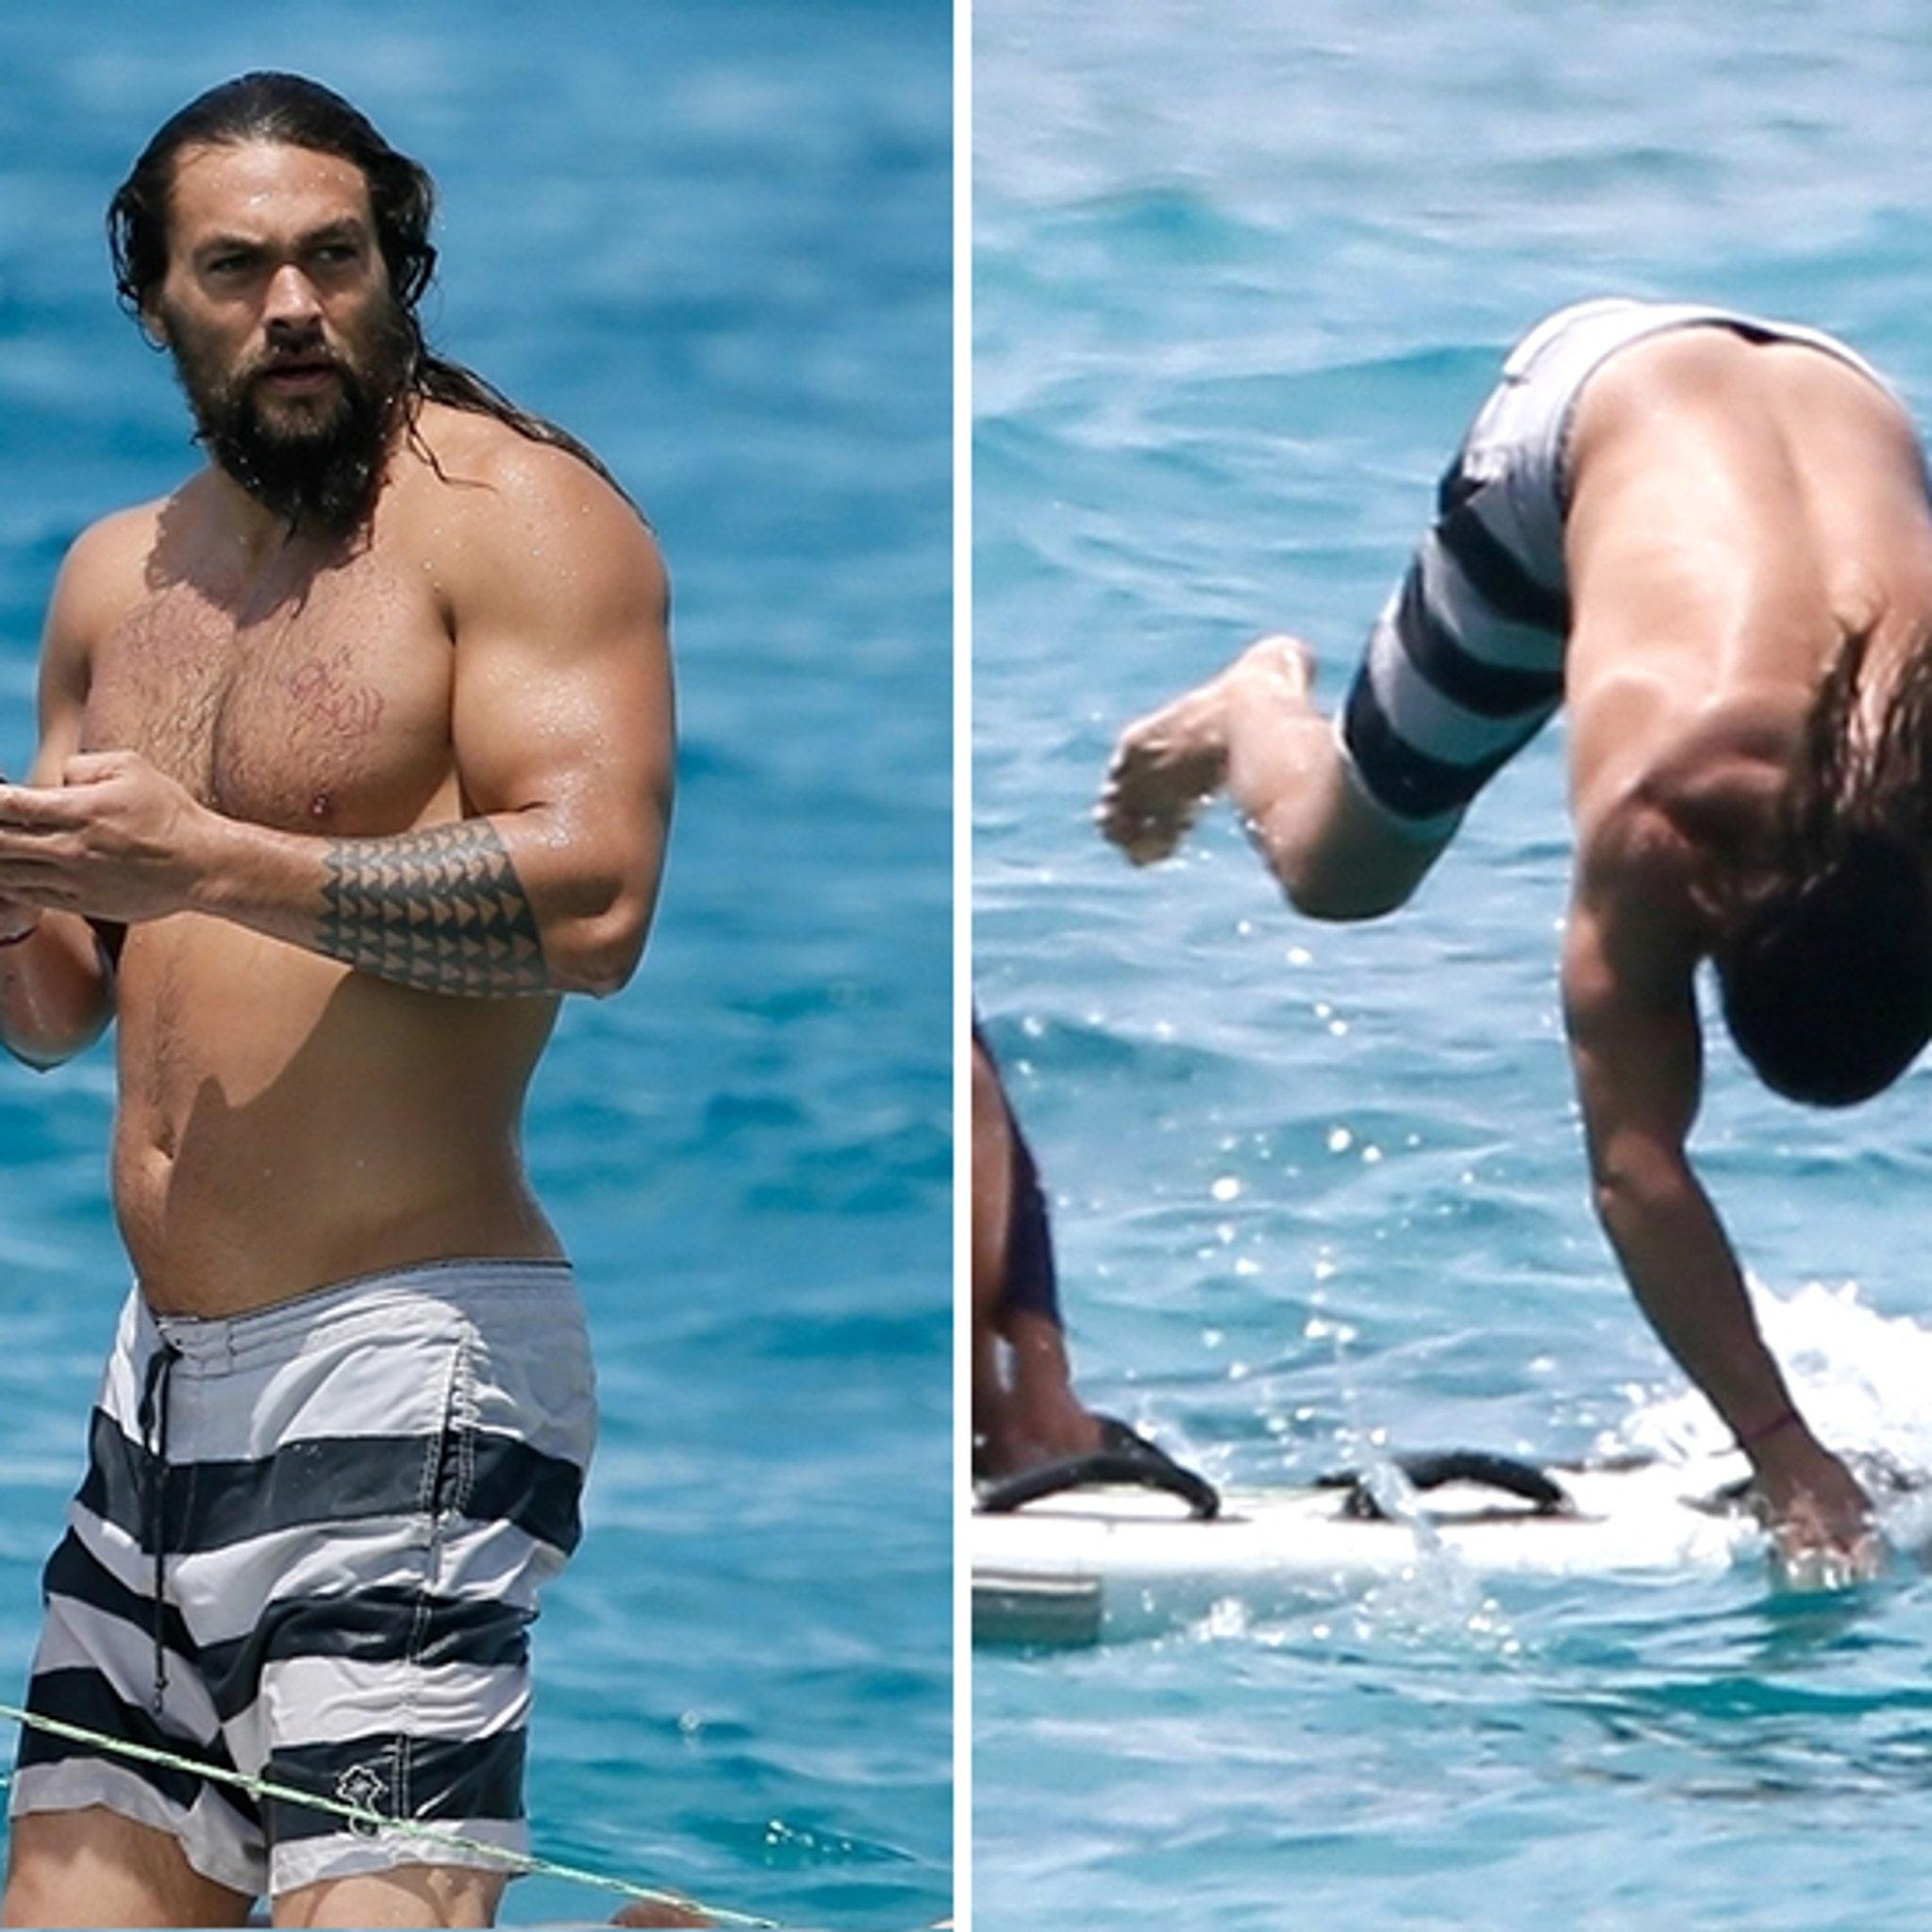 e9756a2e14 Jason Momoa Really Is Aquaman, Dives into Ocean to Save Phone